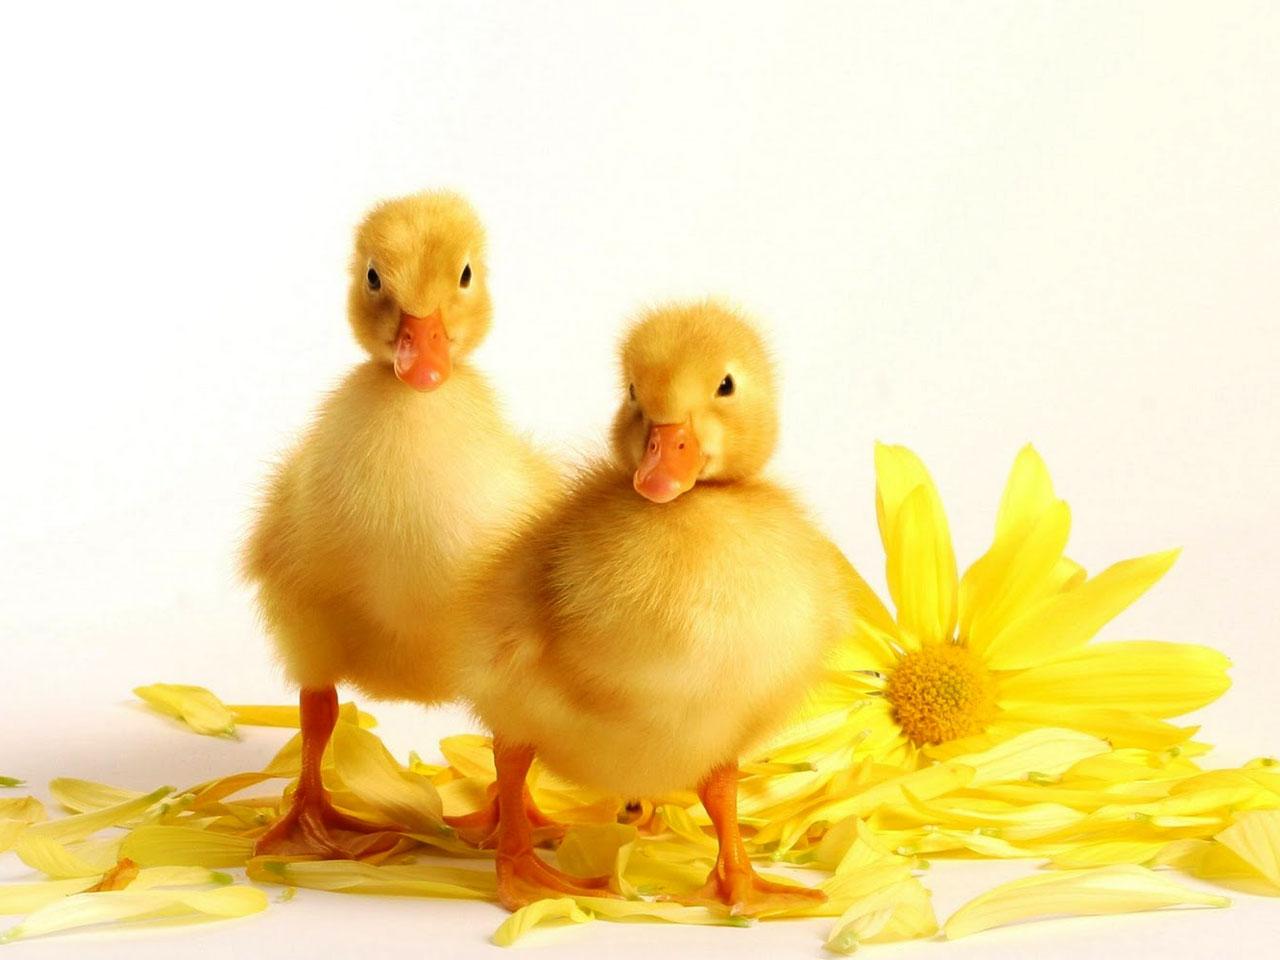 Ducks Wallpaper - Wild Ducks Bird Photo Gallery